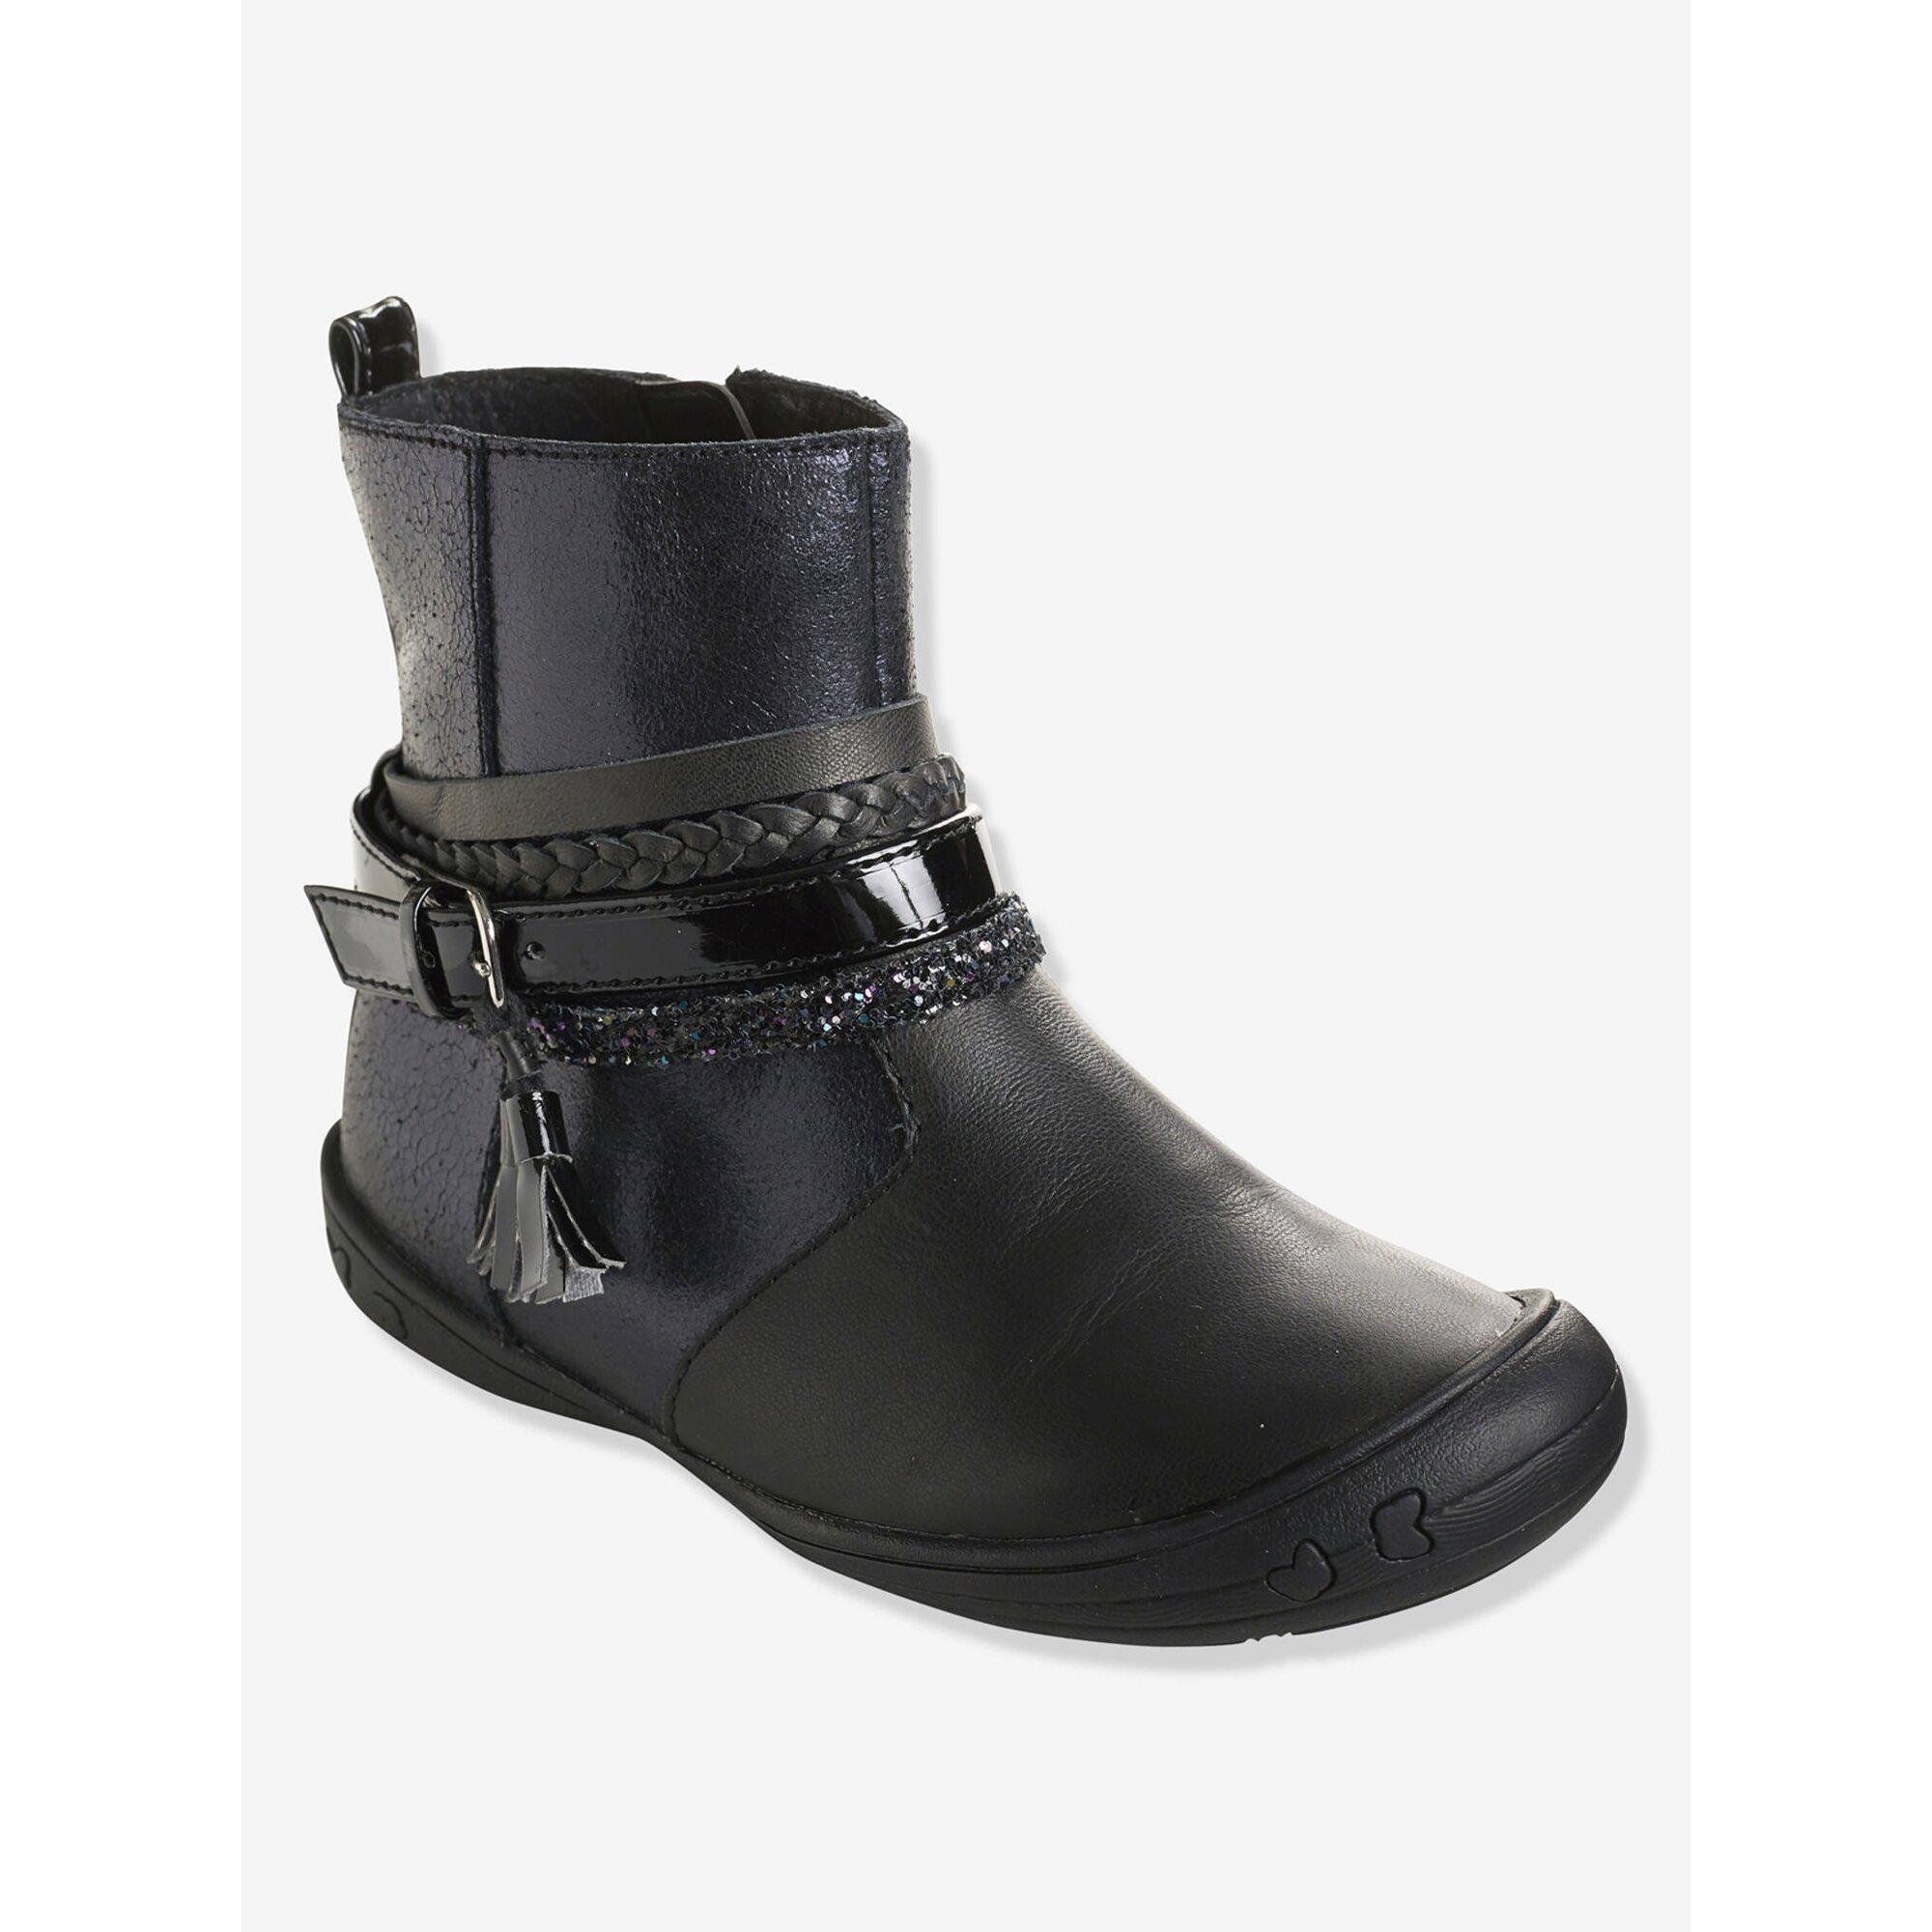 vertbaudet-leder-boots-fur-madchen-gummisohle, 65.99 EUR @ babywalz-de